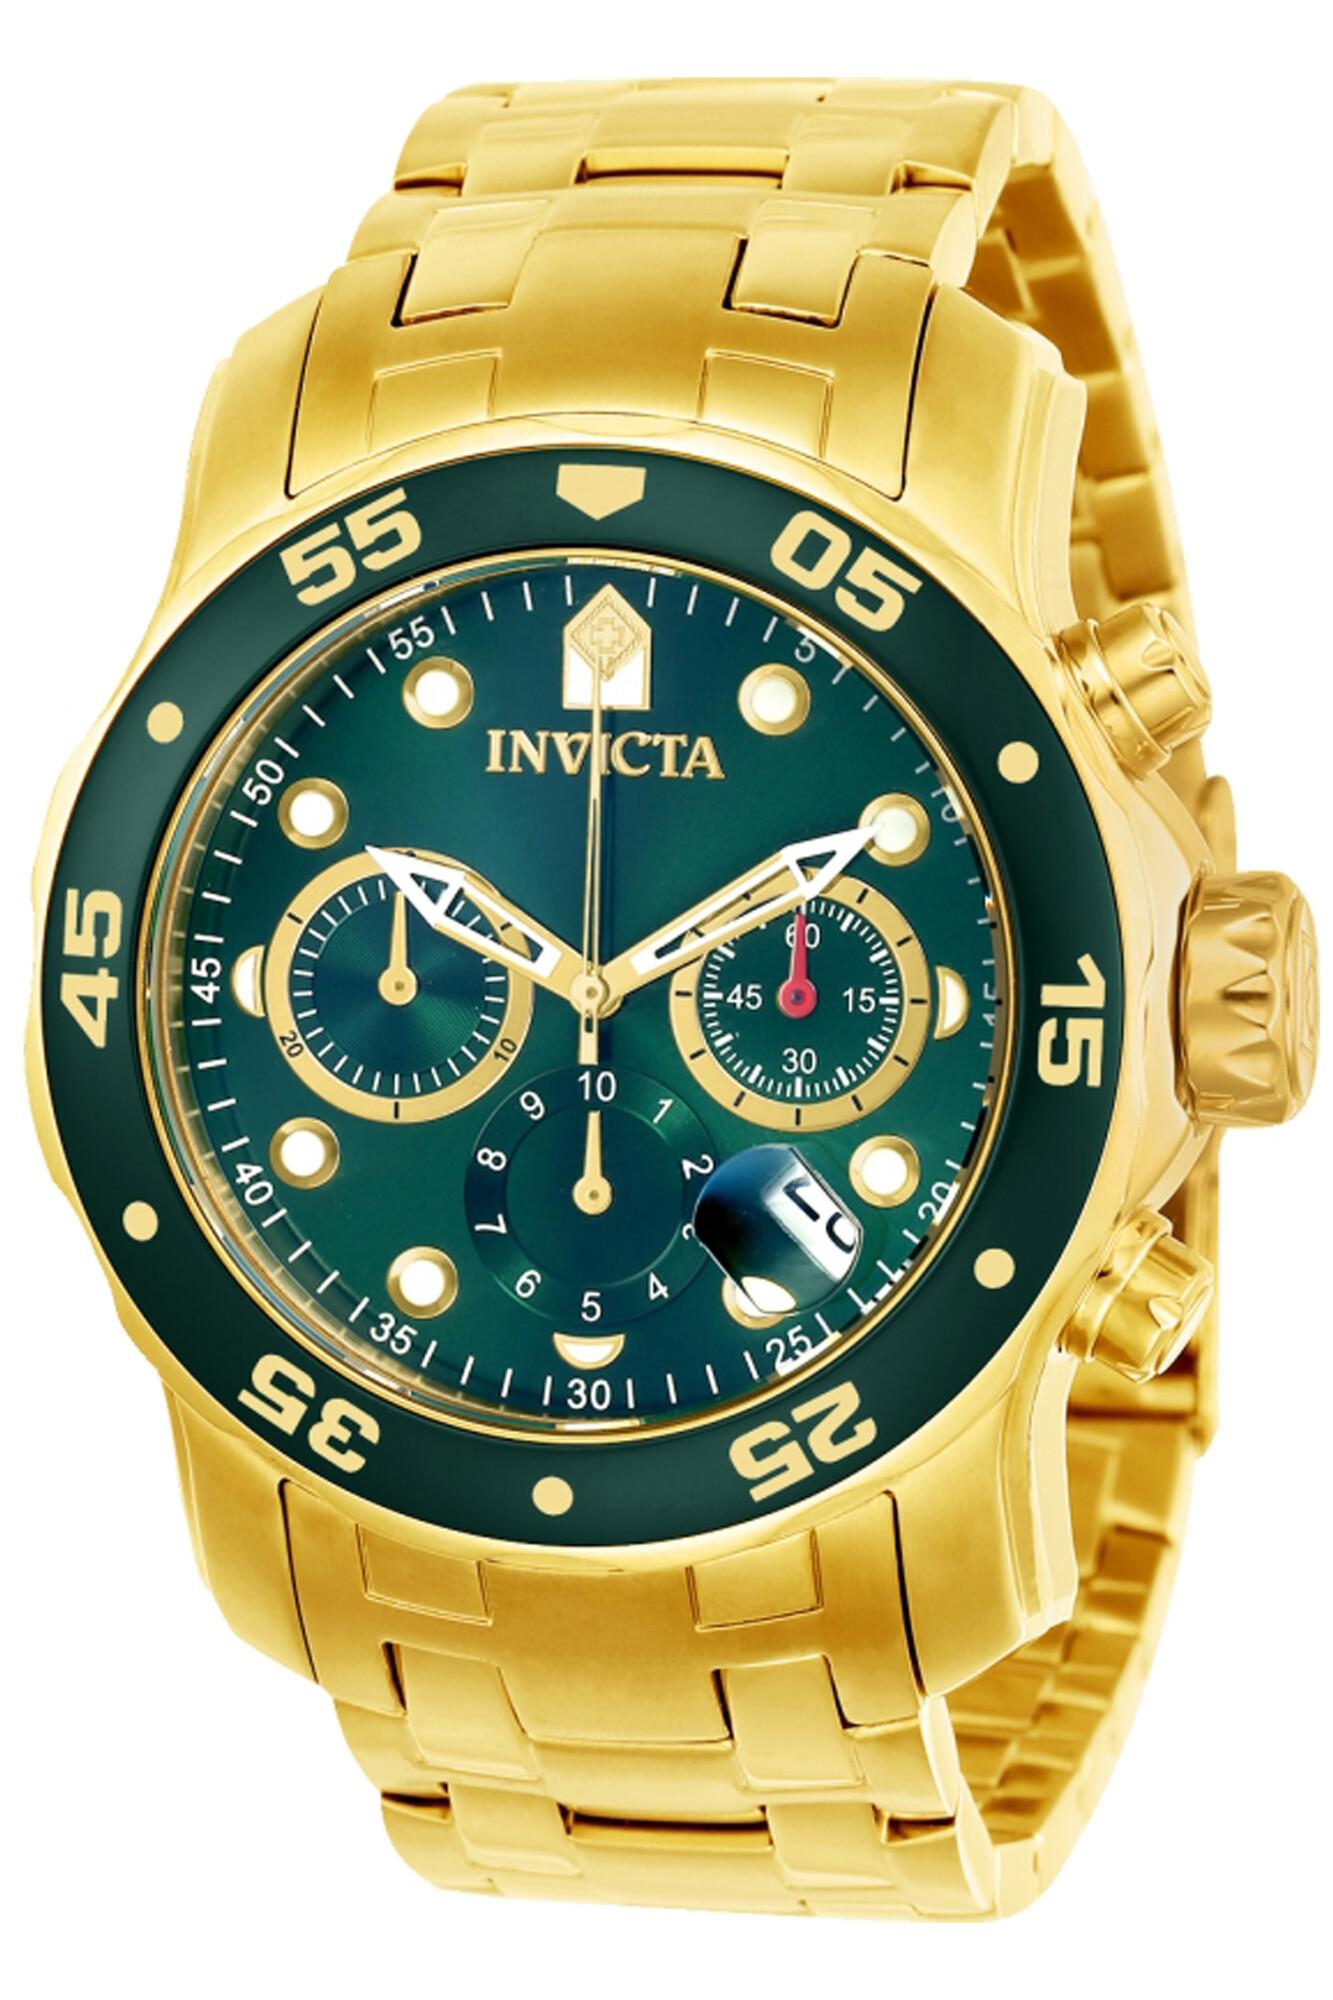 Invicta Men's Pro Diver 21925 Gold Stainless-Steel Quartz Diving Watch